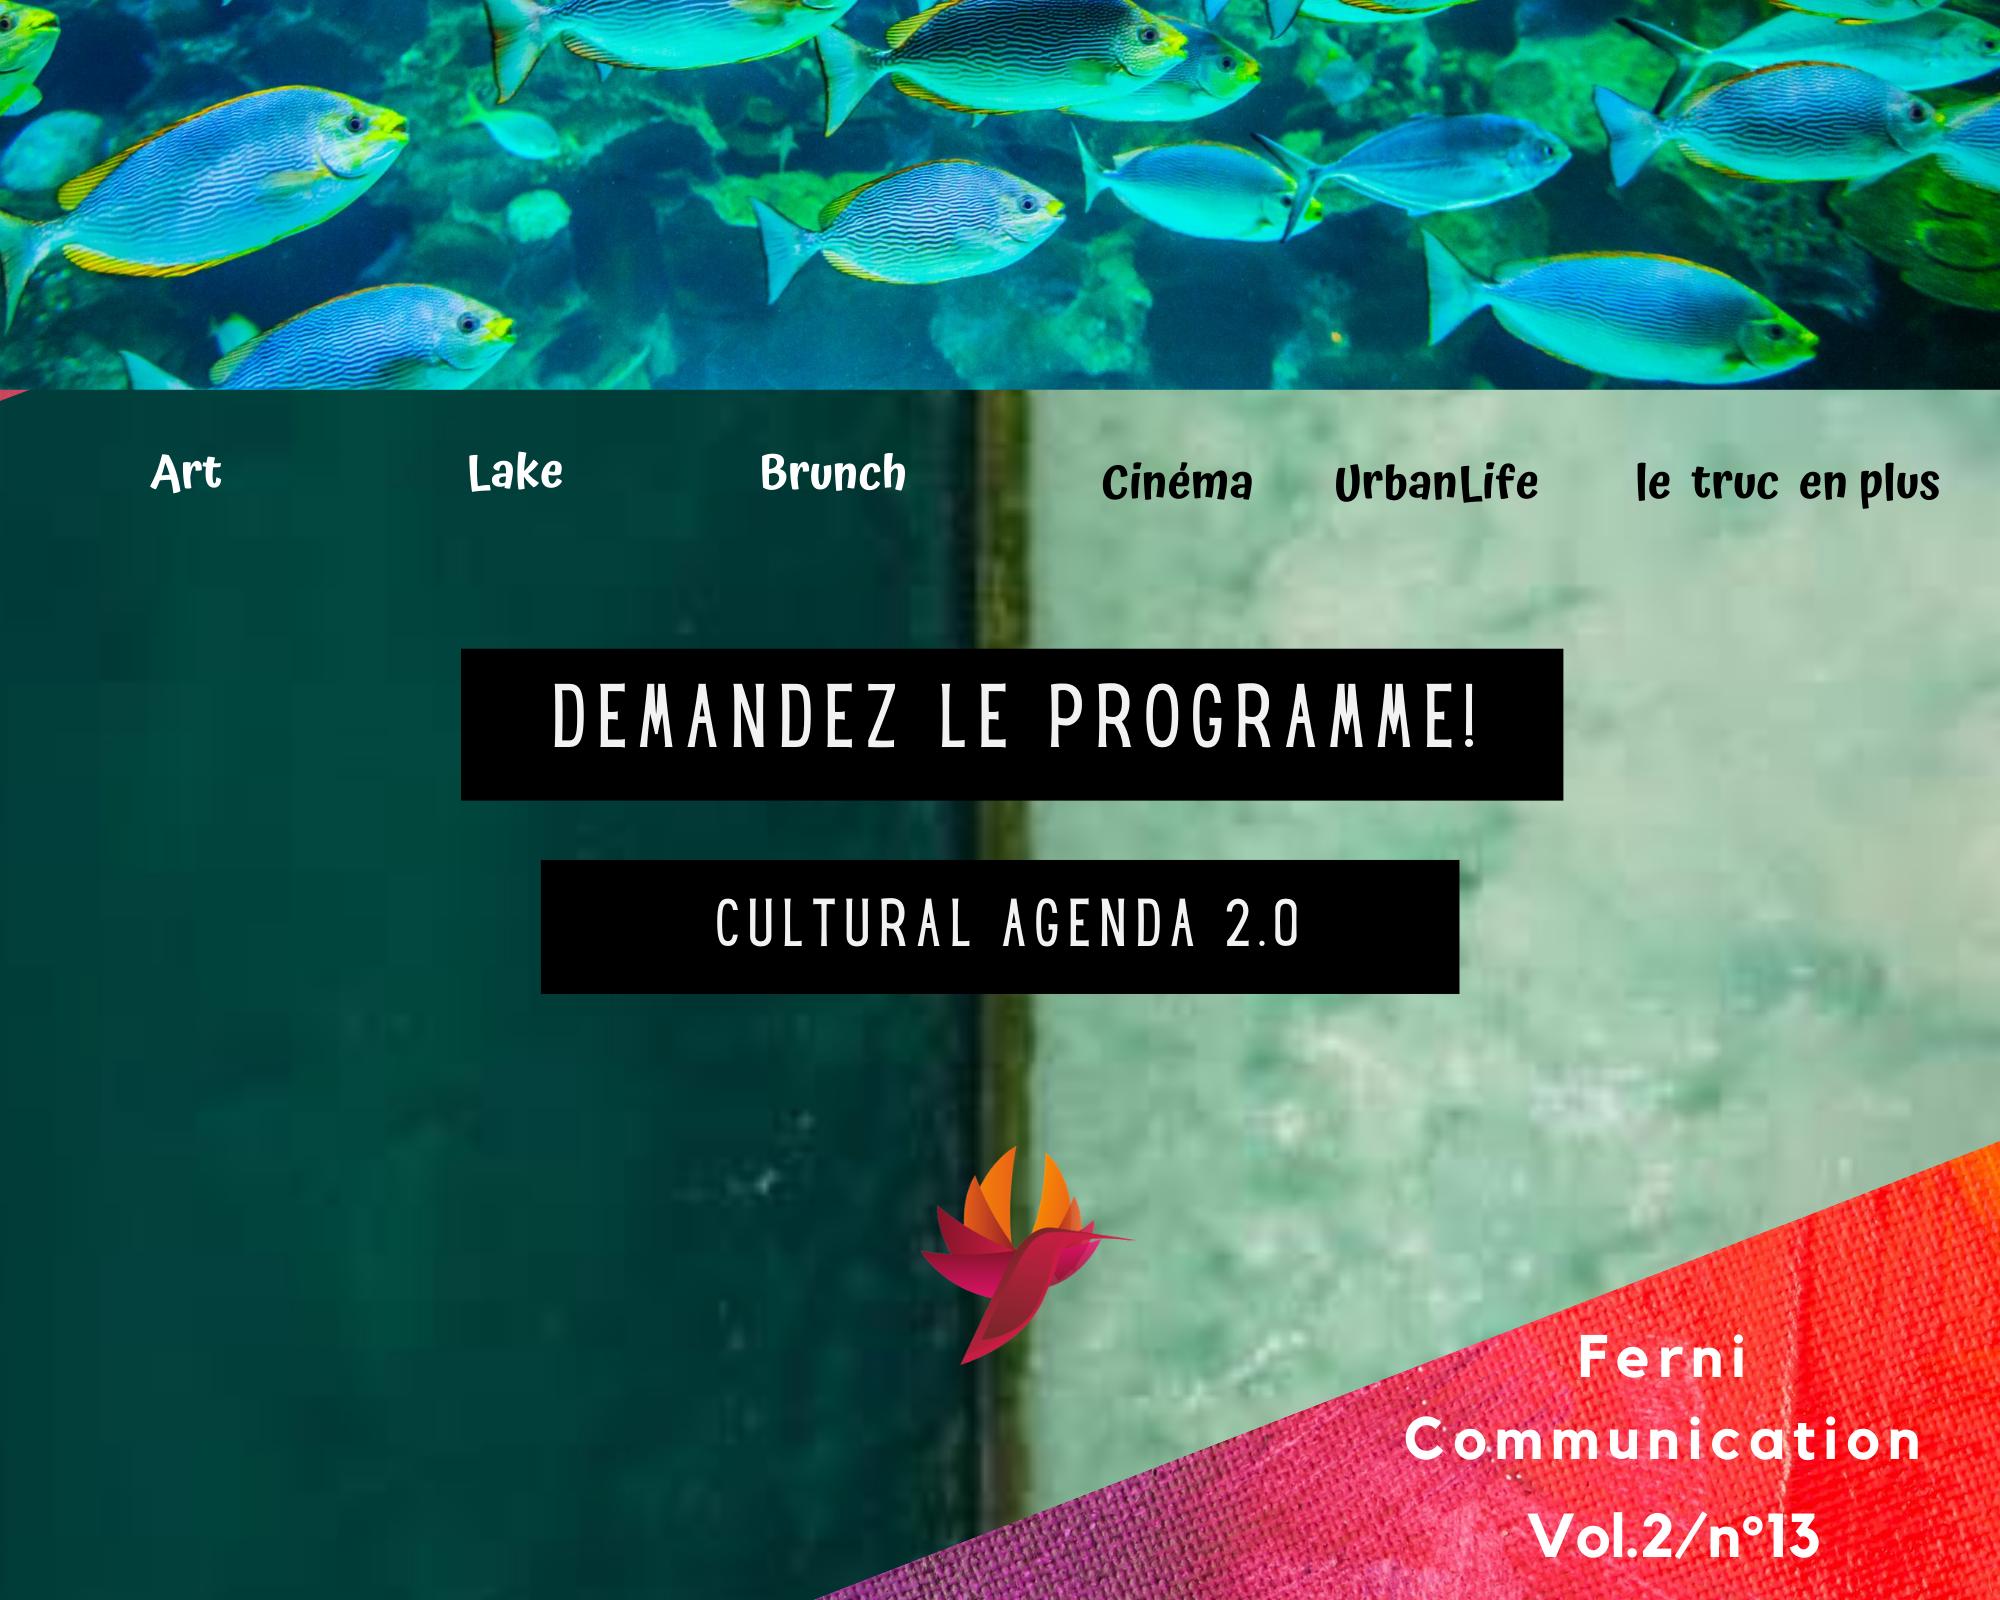 Agenda Culturel Geneva Things to do Ferni Communication